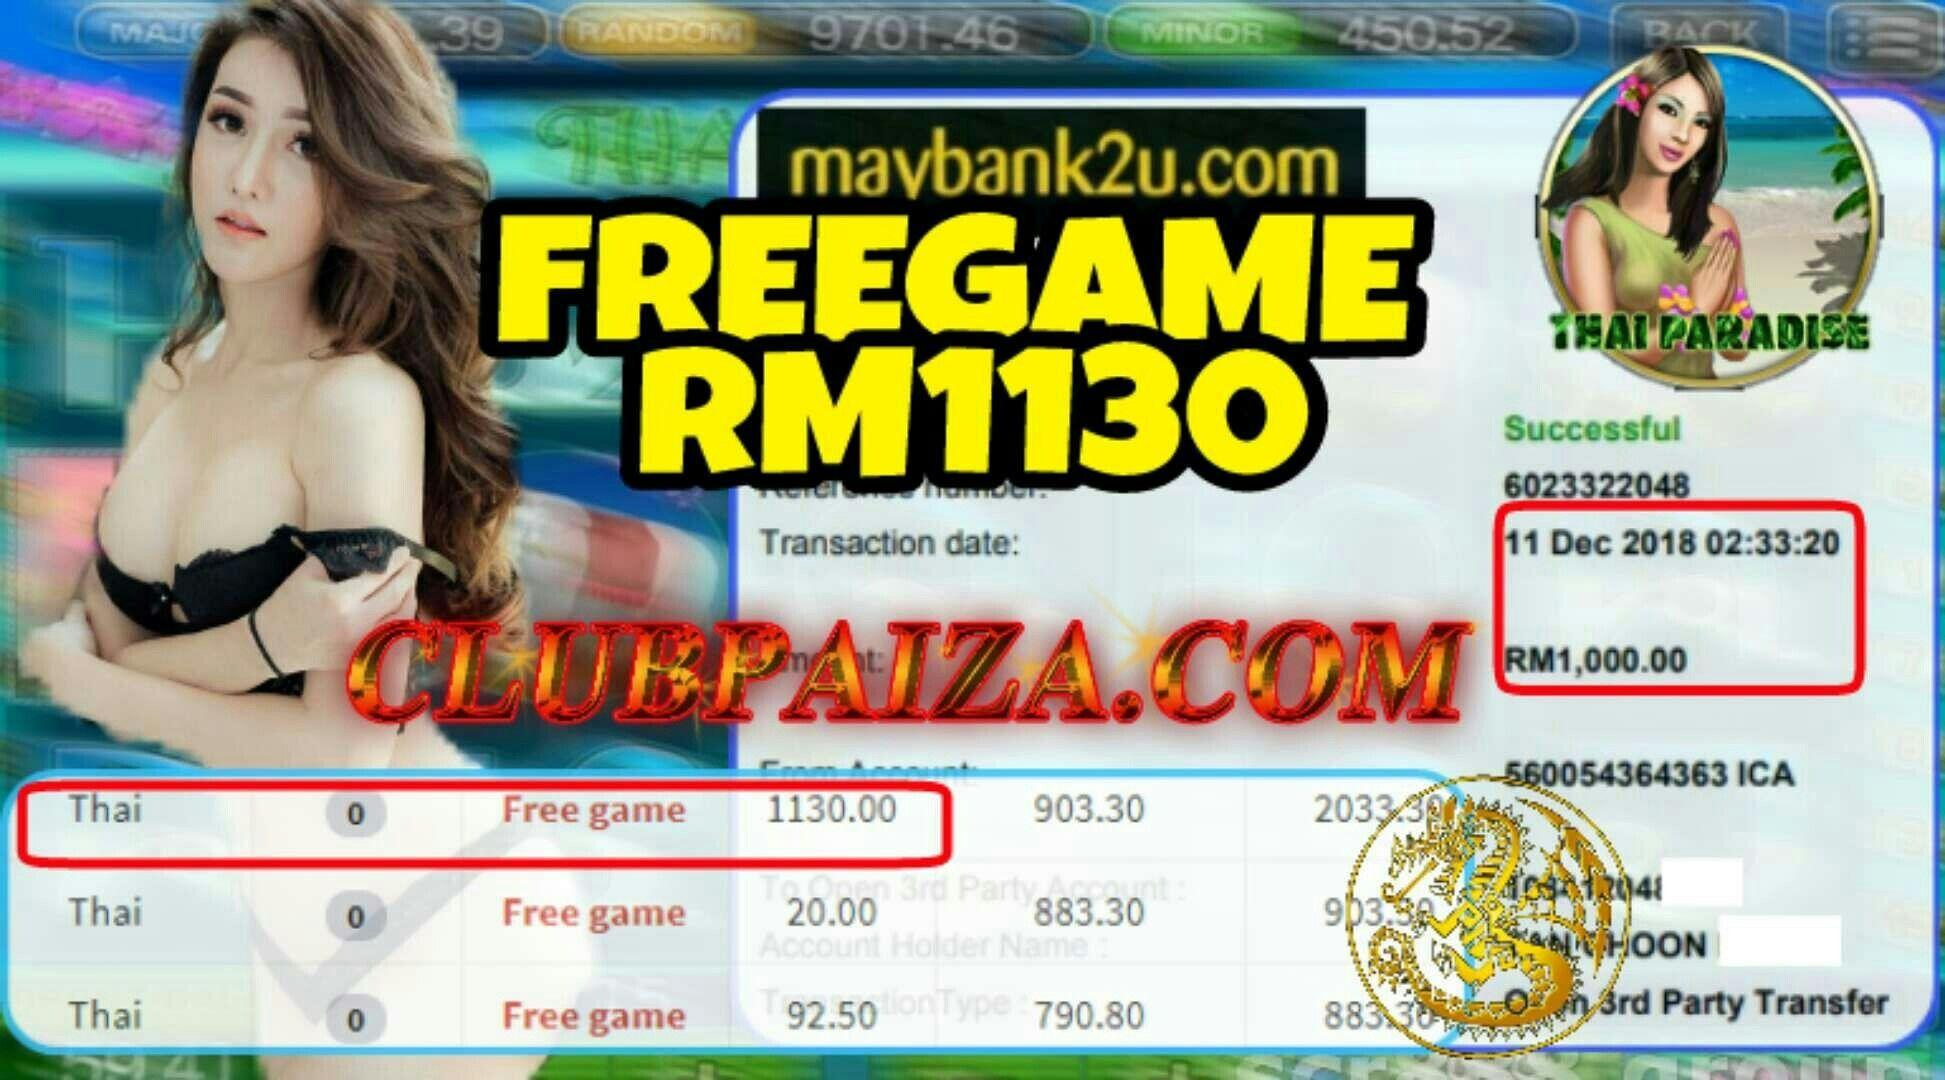 918 KISS ❗THAI PARADISE❗ FREEGAME NONSTOP WITHDRAWAL RM1000